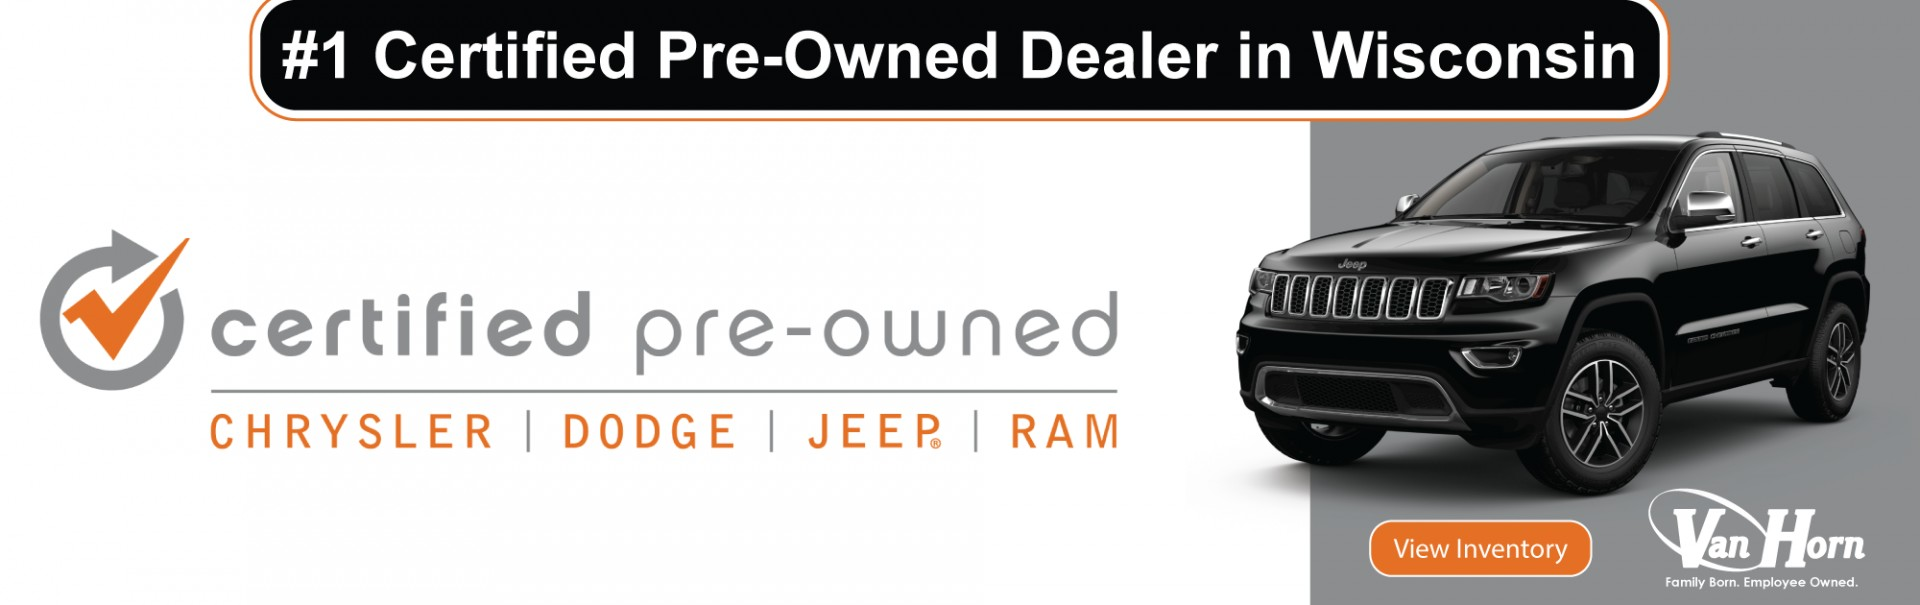 #1 Certified Pre-Owned Dealer in Wisconsin